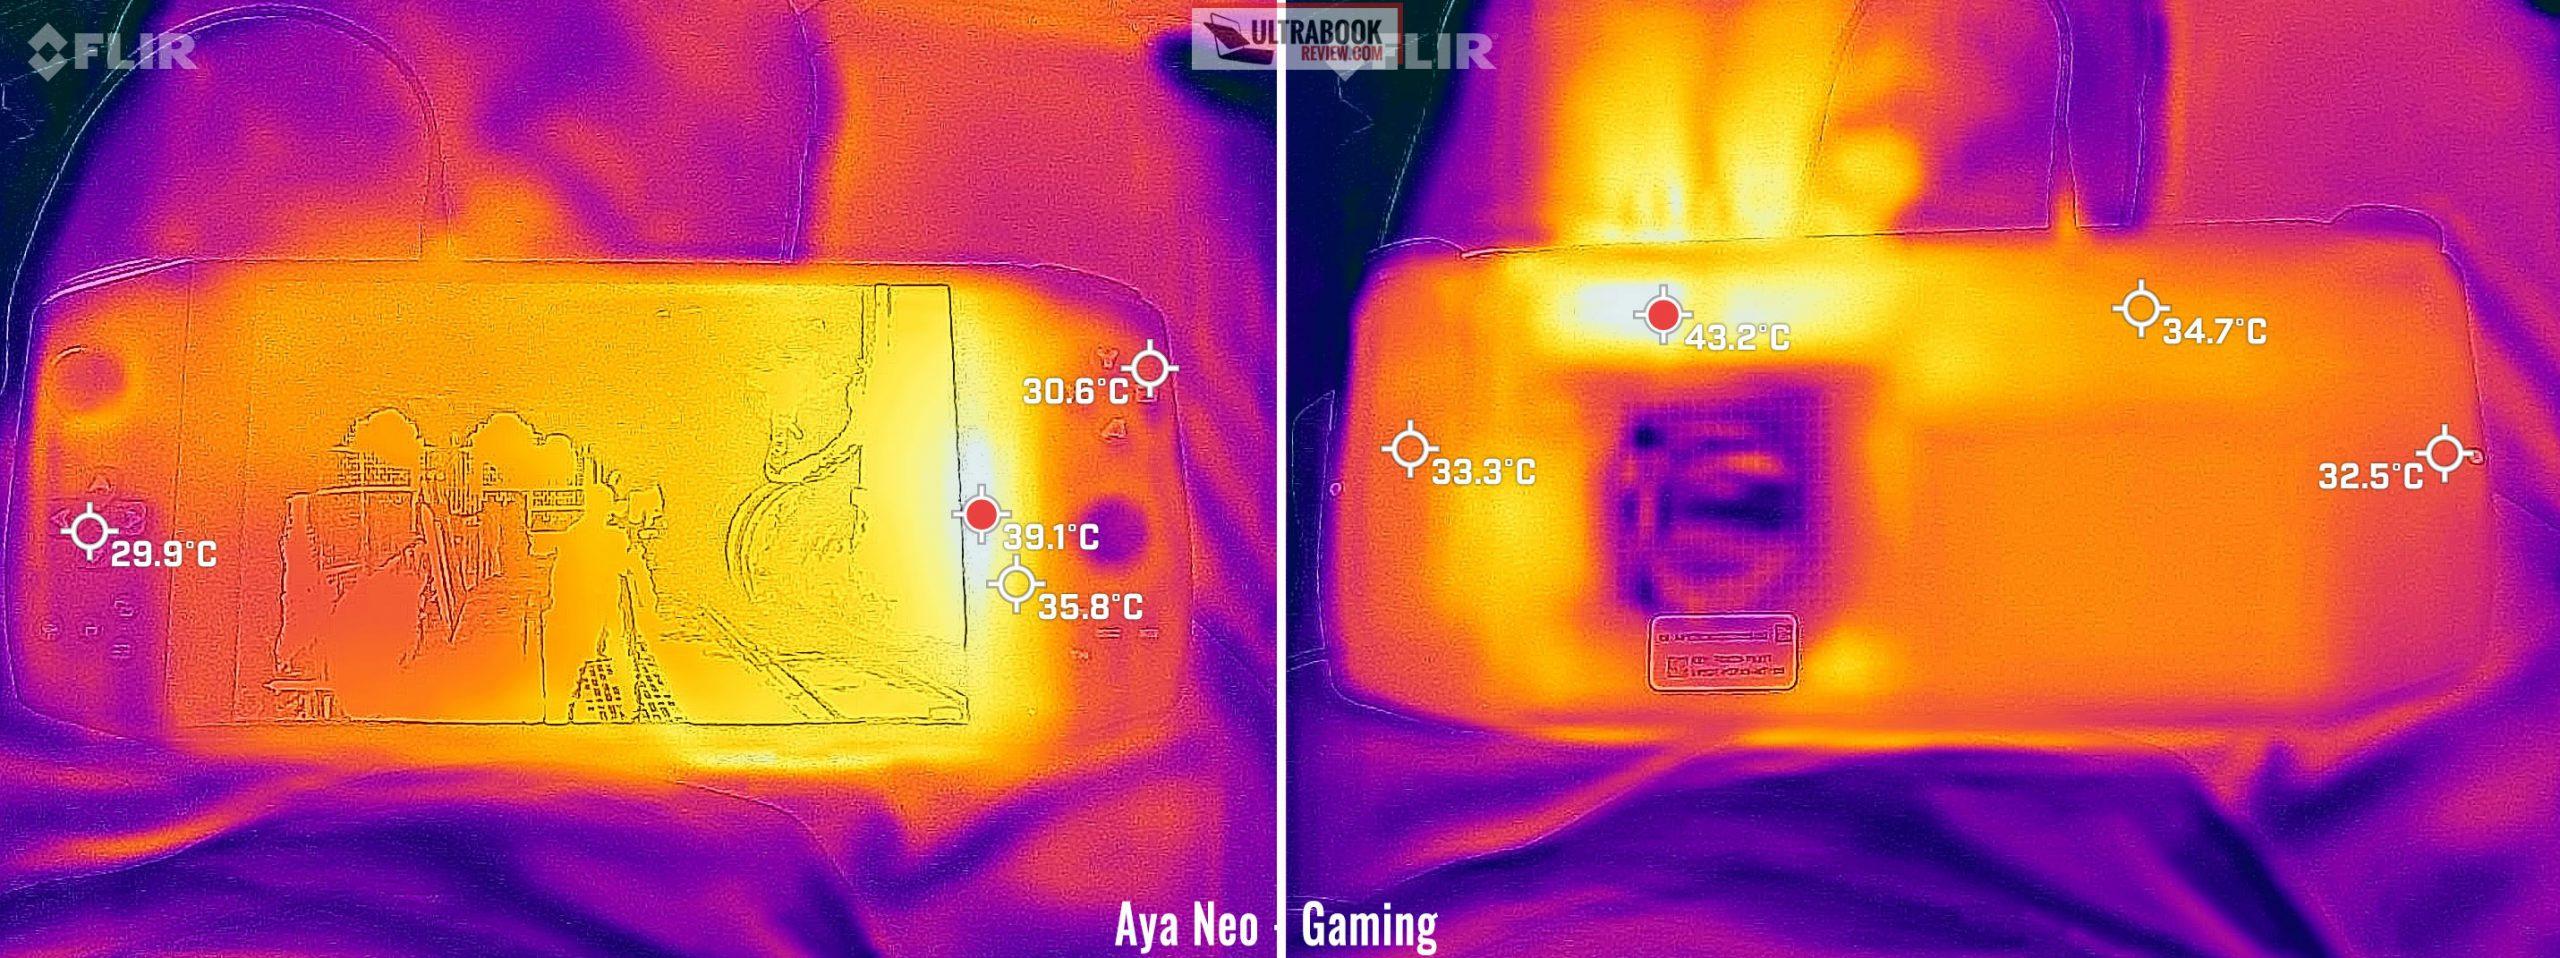 temperatures-aya-neo-scaled.jpg